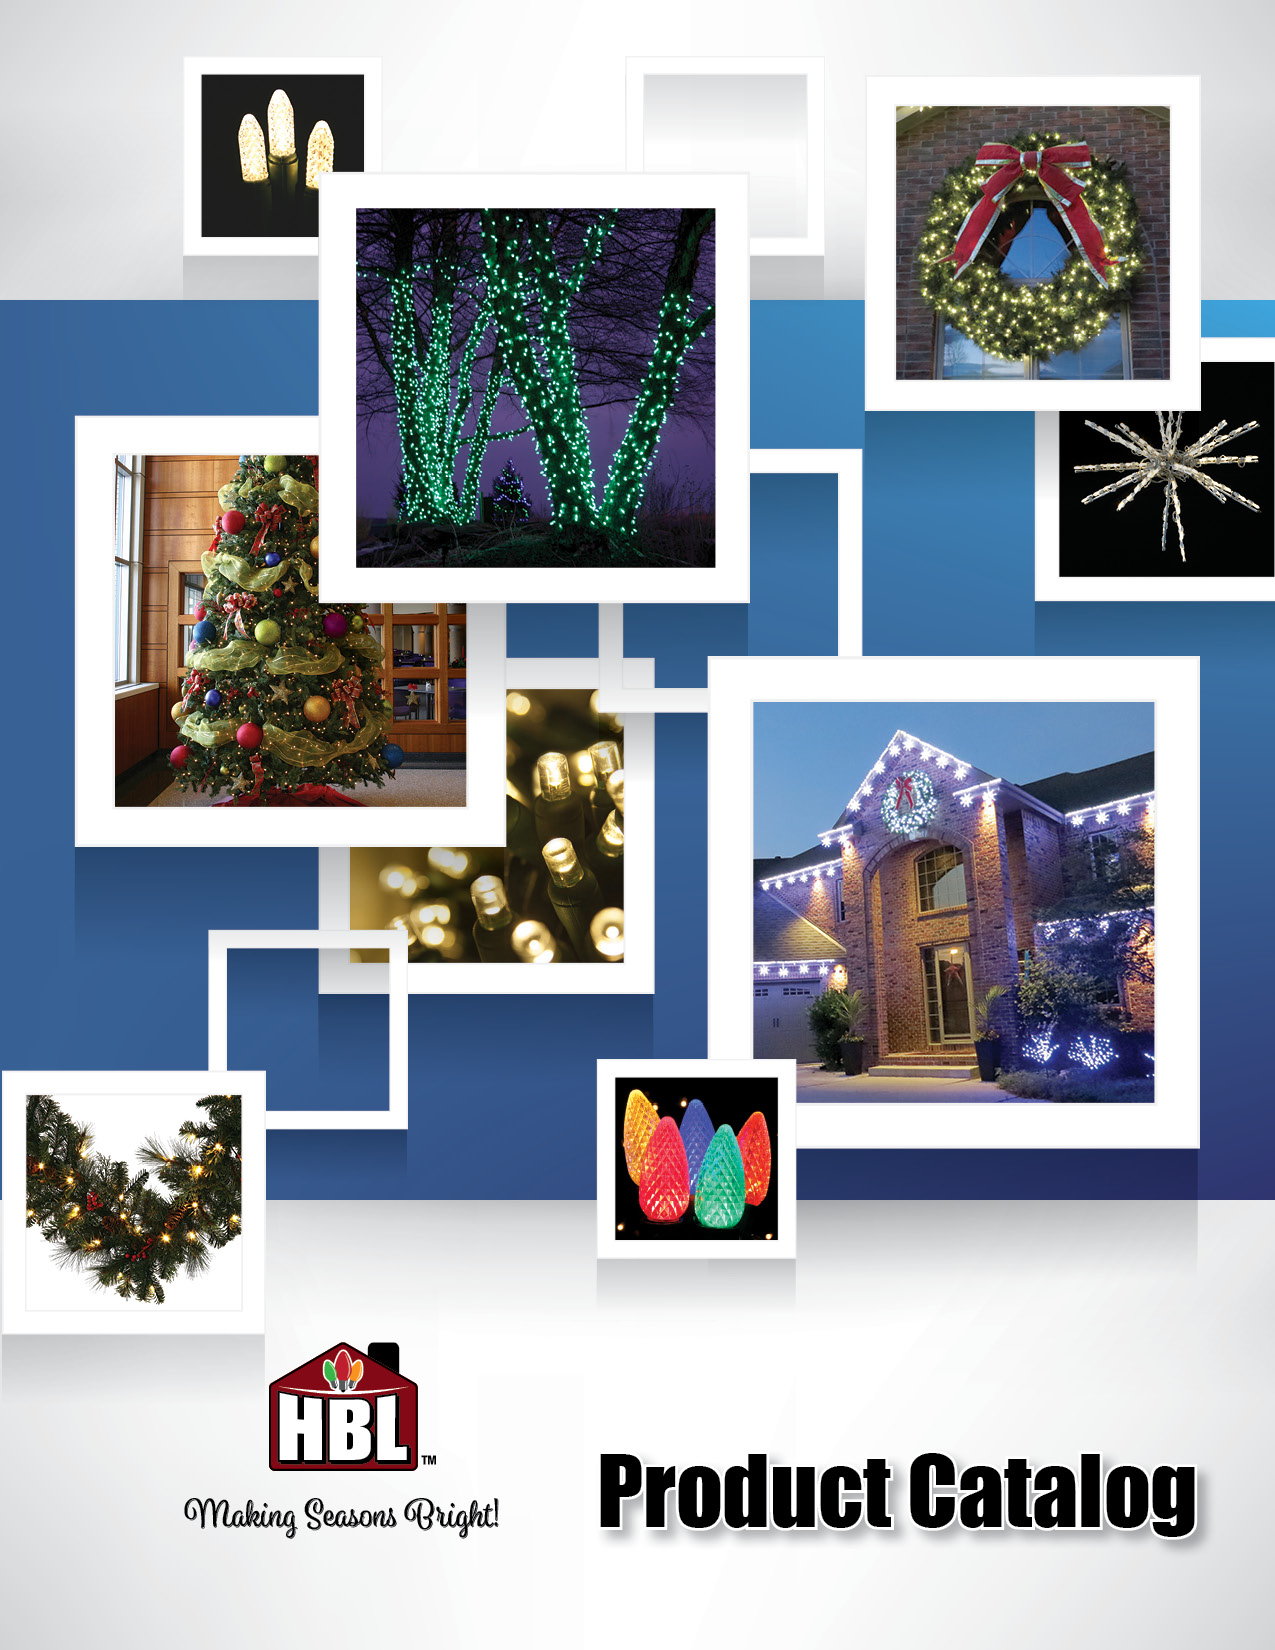 HBL_Catalog_150.jpg